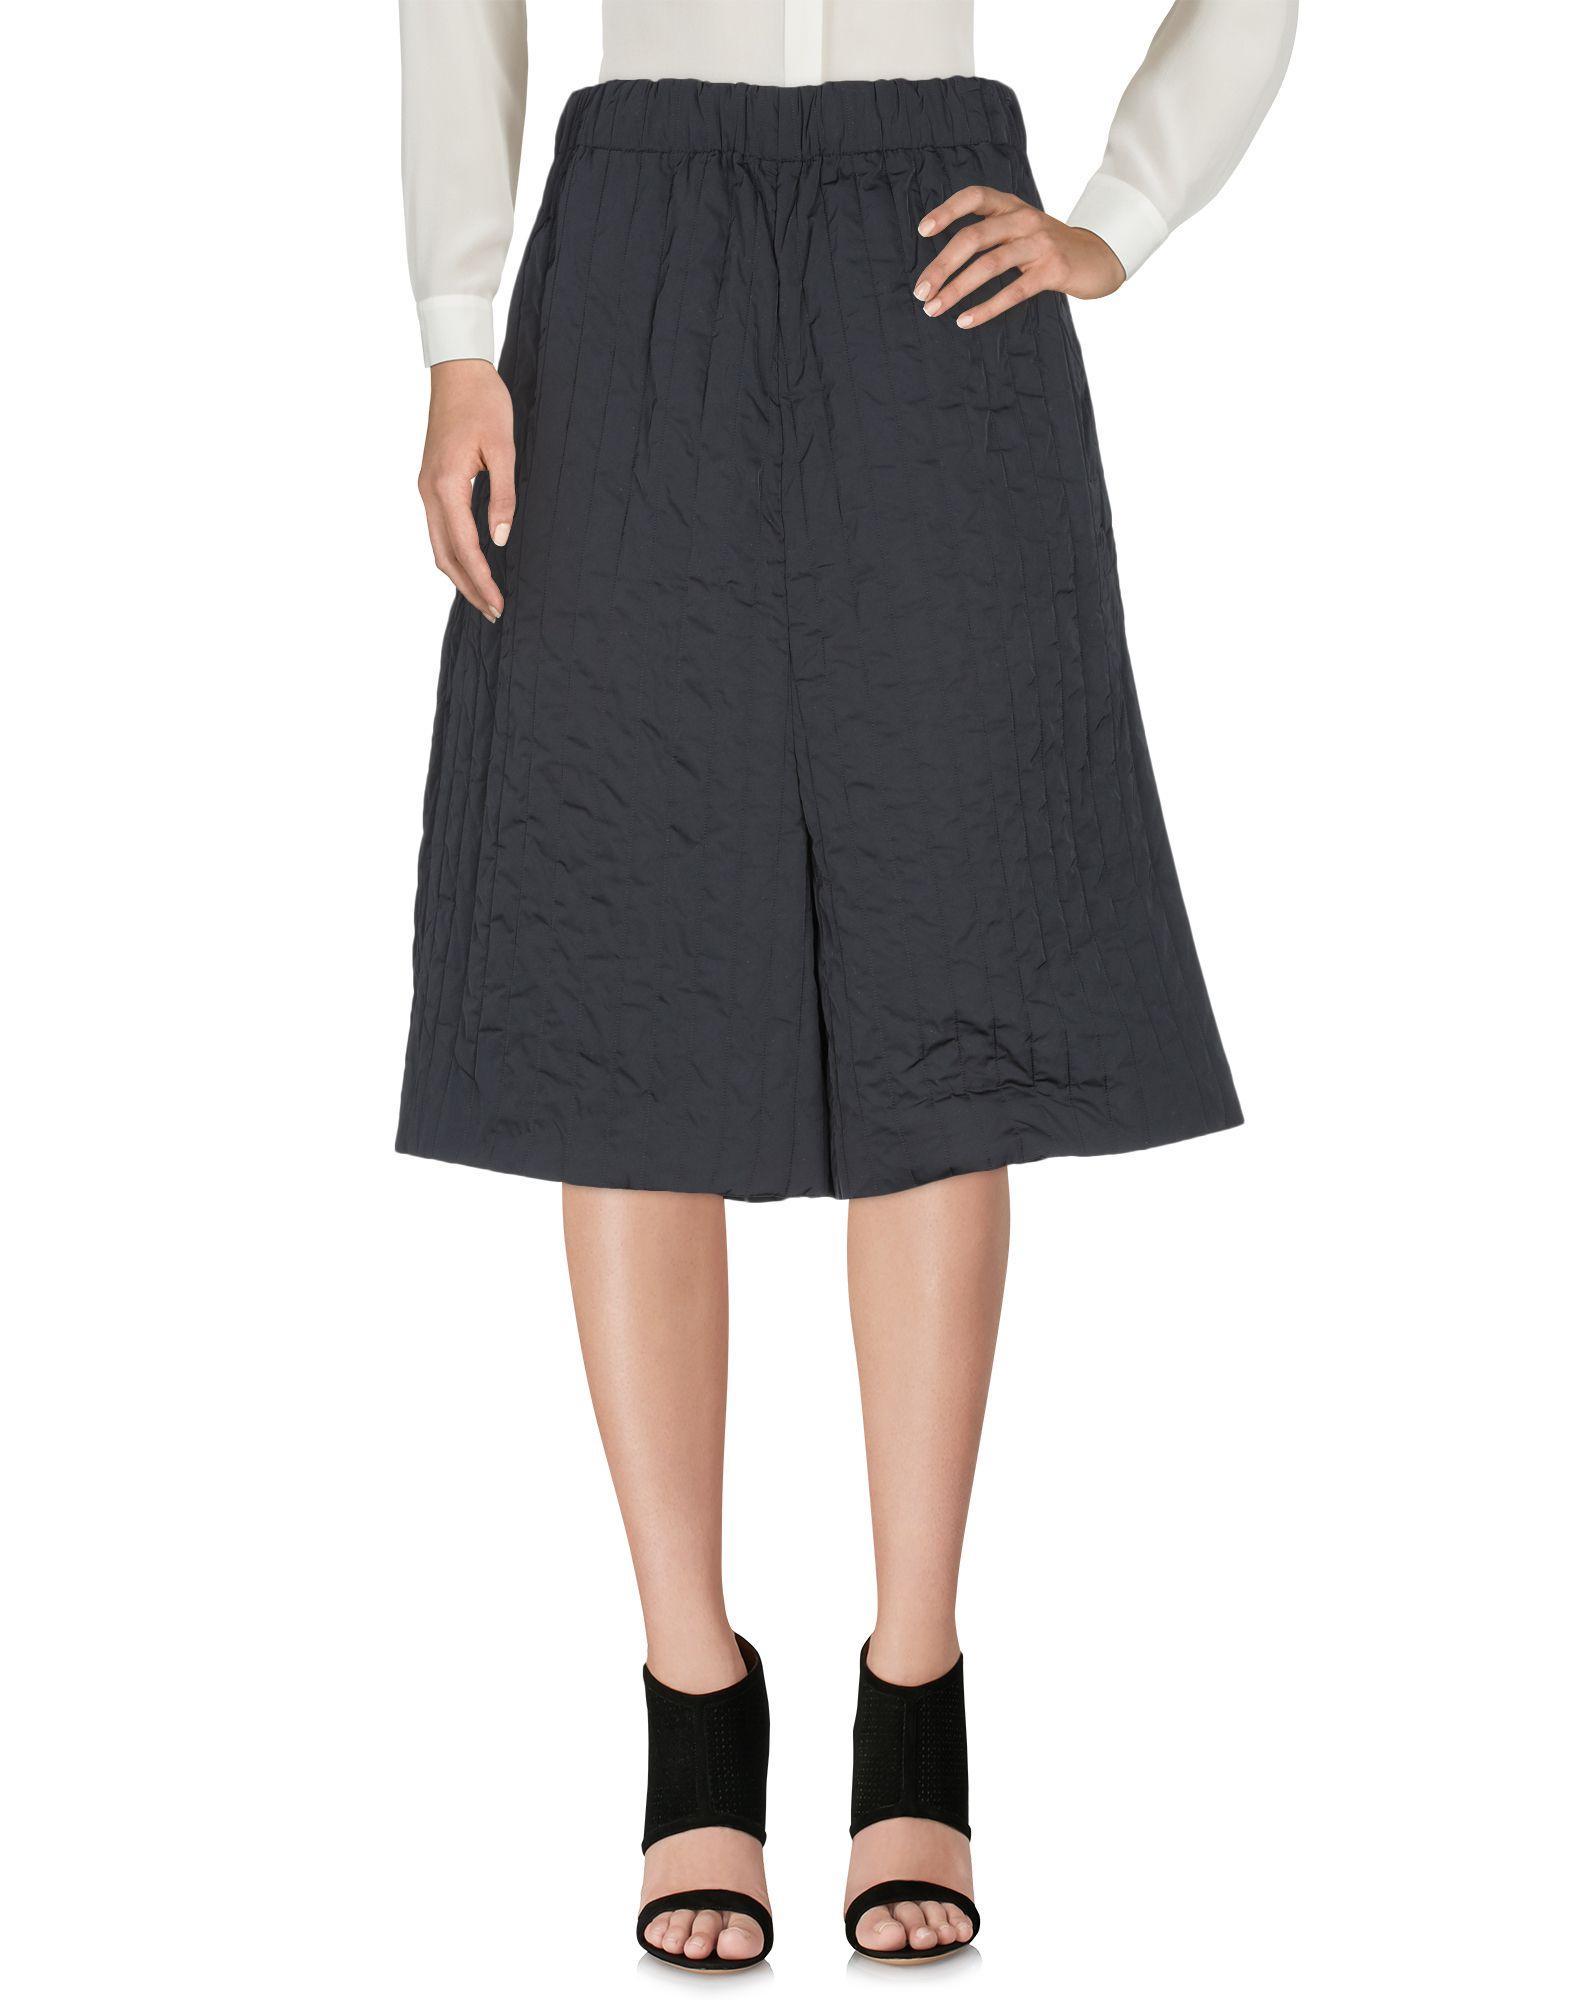 Jil Sander 3/4-Length Shorts In Black